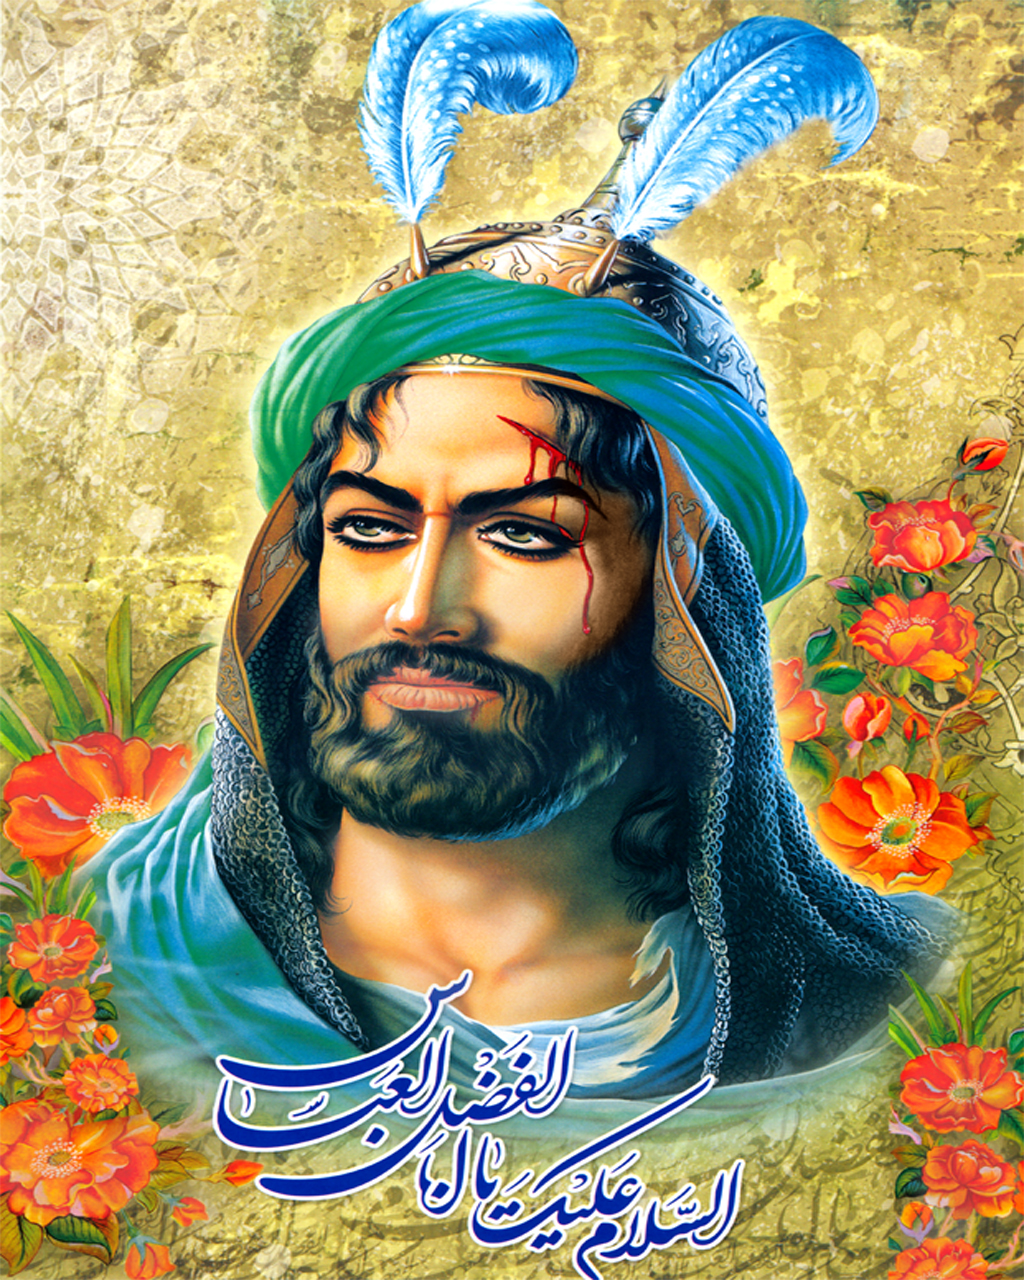 عکس حضرت ابوالفضل برای پروفایل , تبریک میلاد حضرت عباس , تبریک میلاد حضرت ابوالفضل العباس